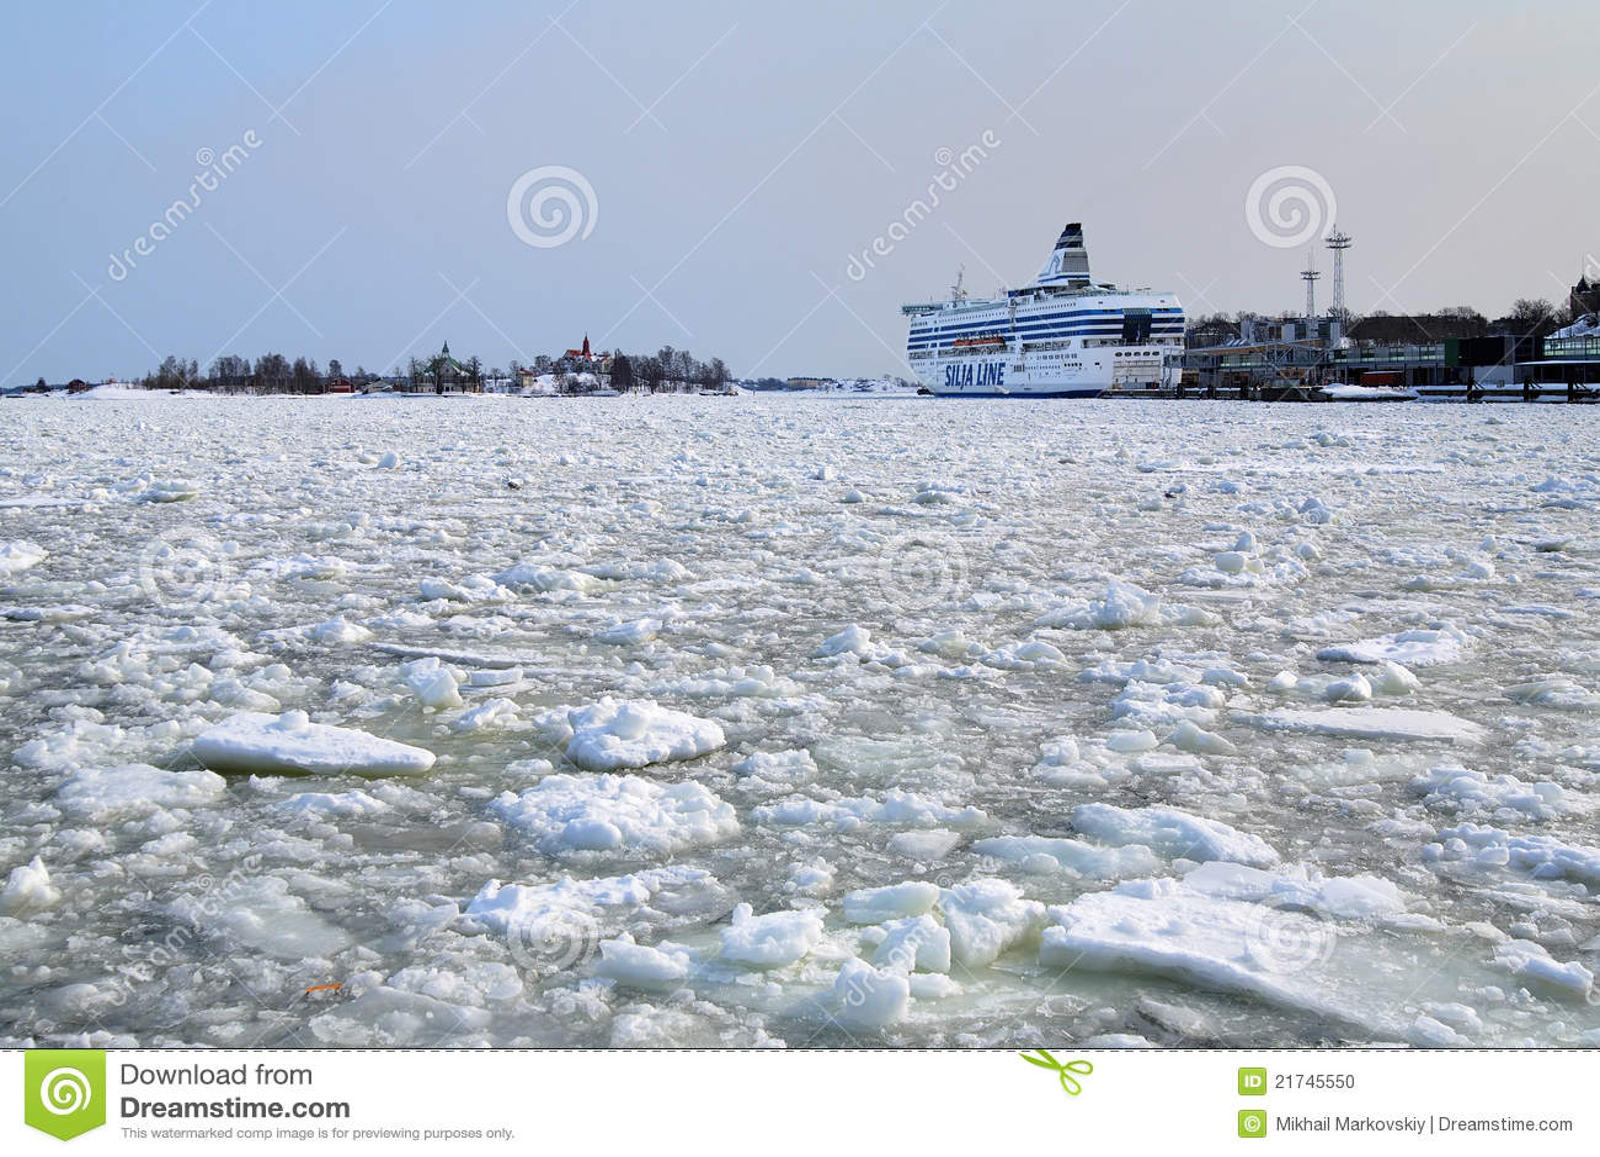 Stockholm To Helsinki Ferry Travel Time